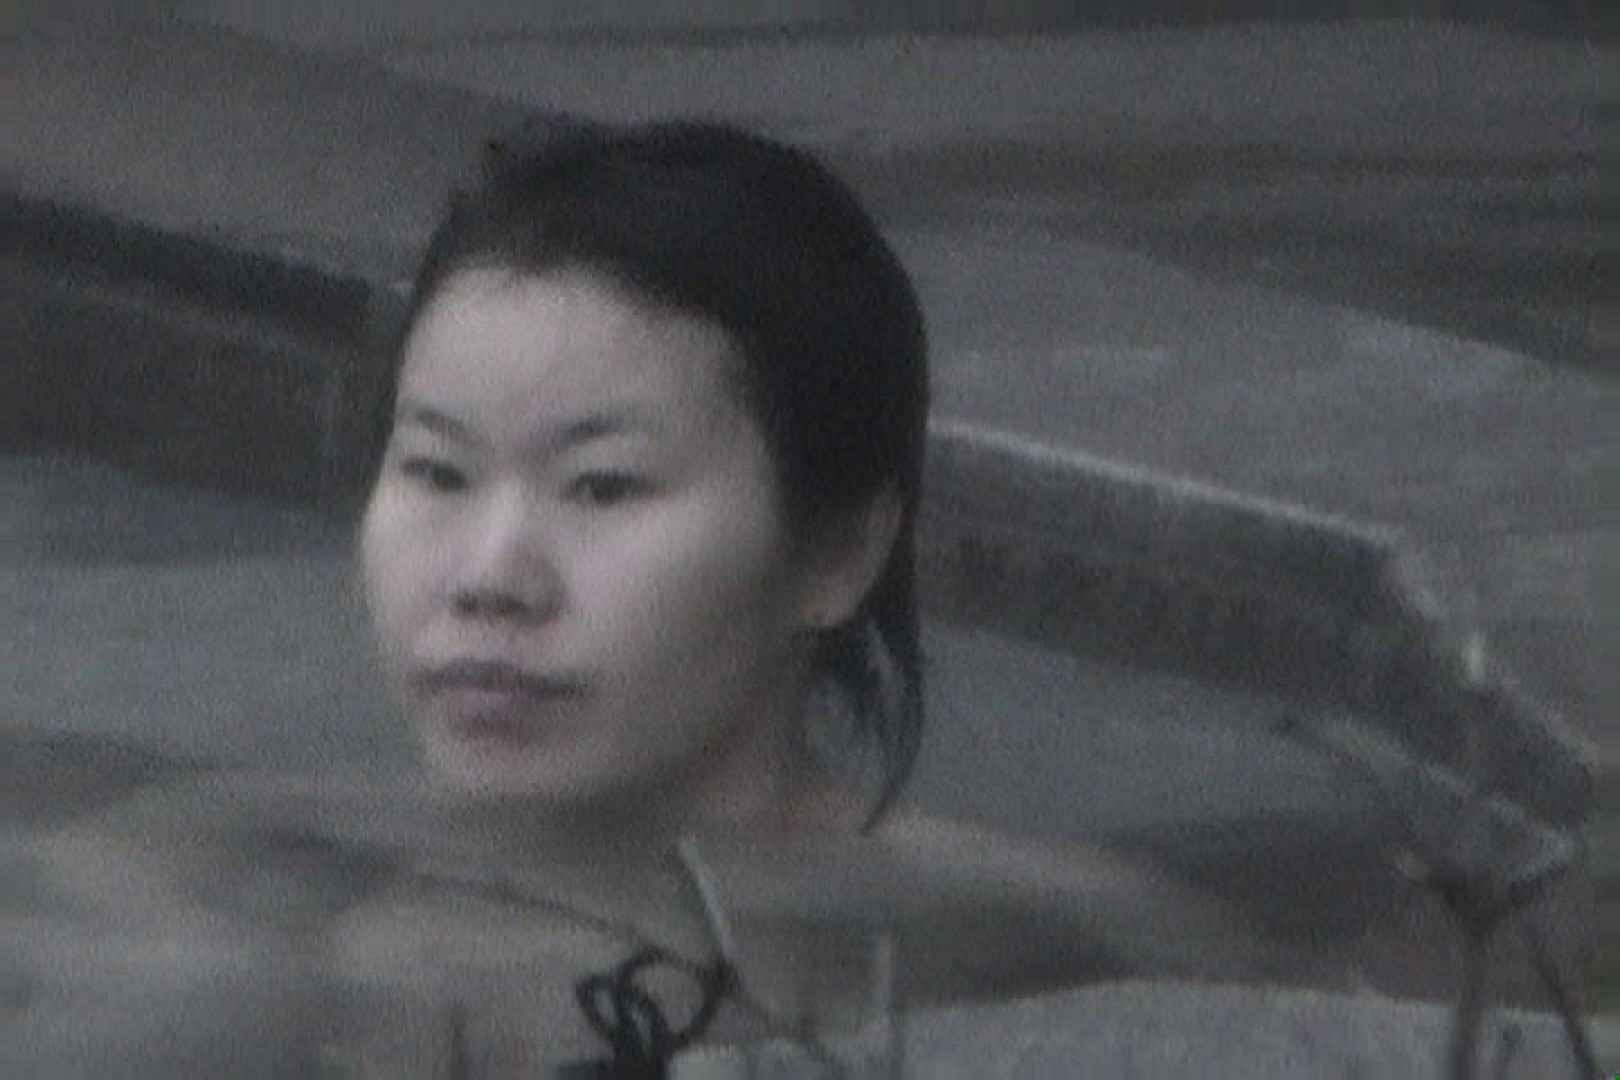 Aquaな露天風呂Vol.556 露天風呂編 | 盗撮シリーズ  99PIX 23